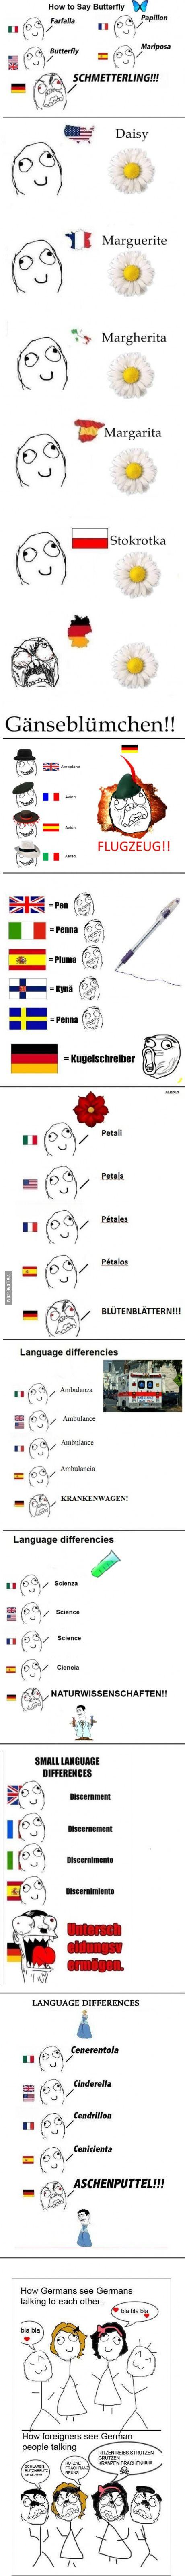 The German language ...grapje zus;)